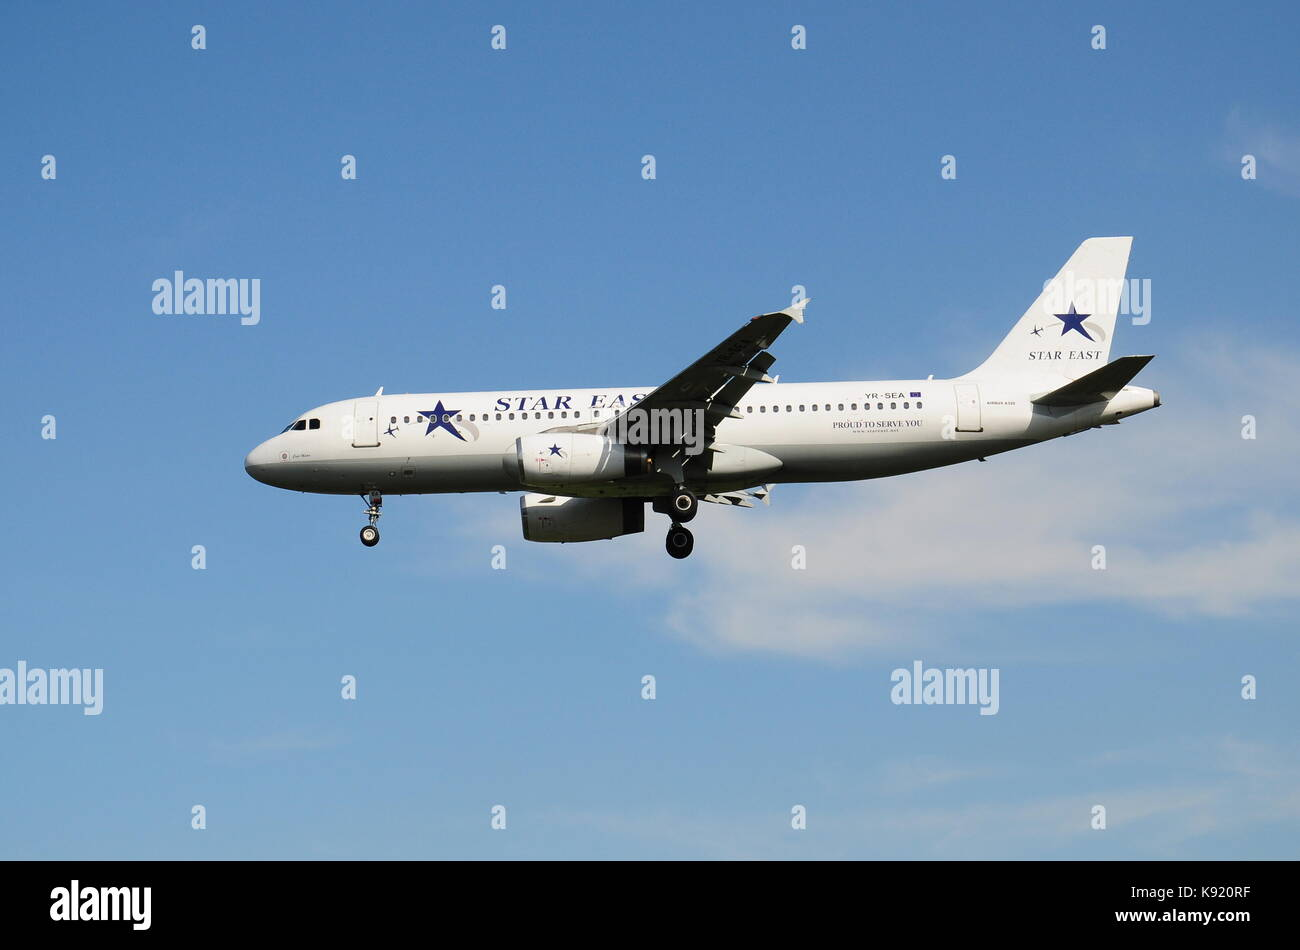 Czech Airlines Star